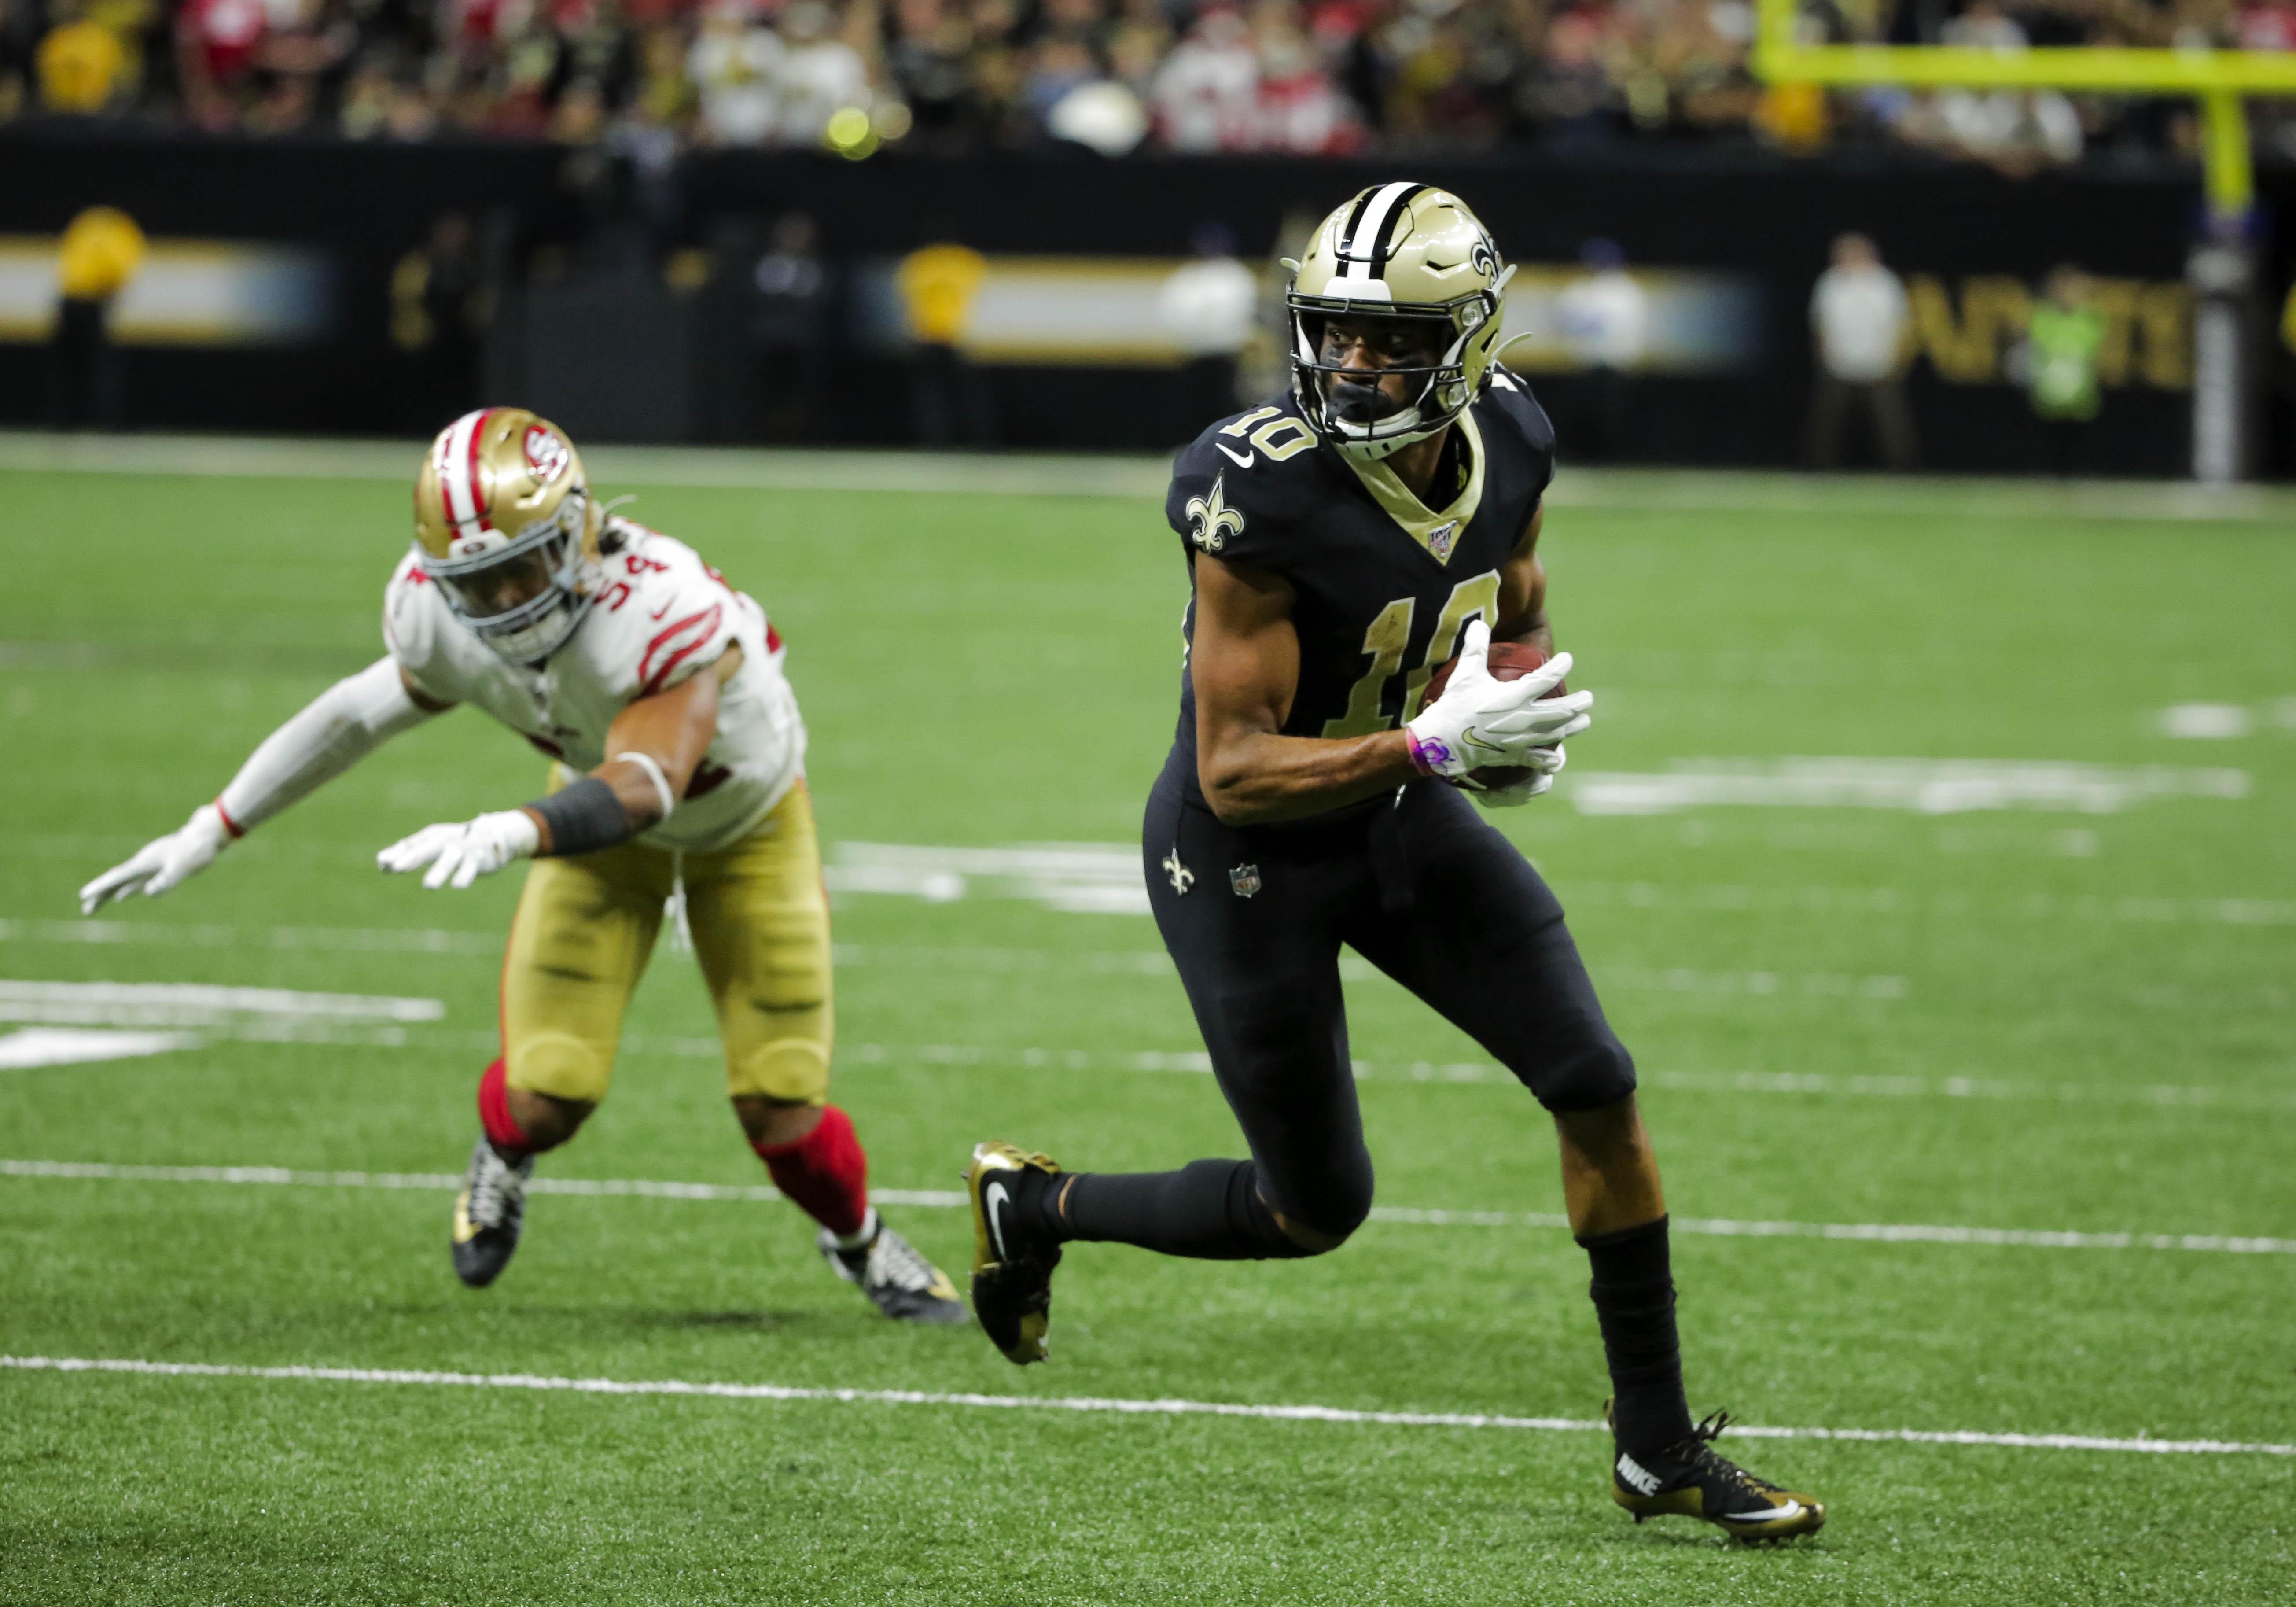 NFL: San Francisco 49ers at New Orleans Saints